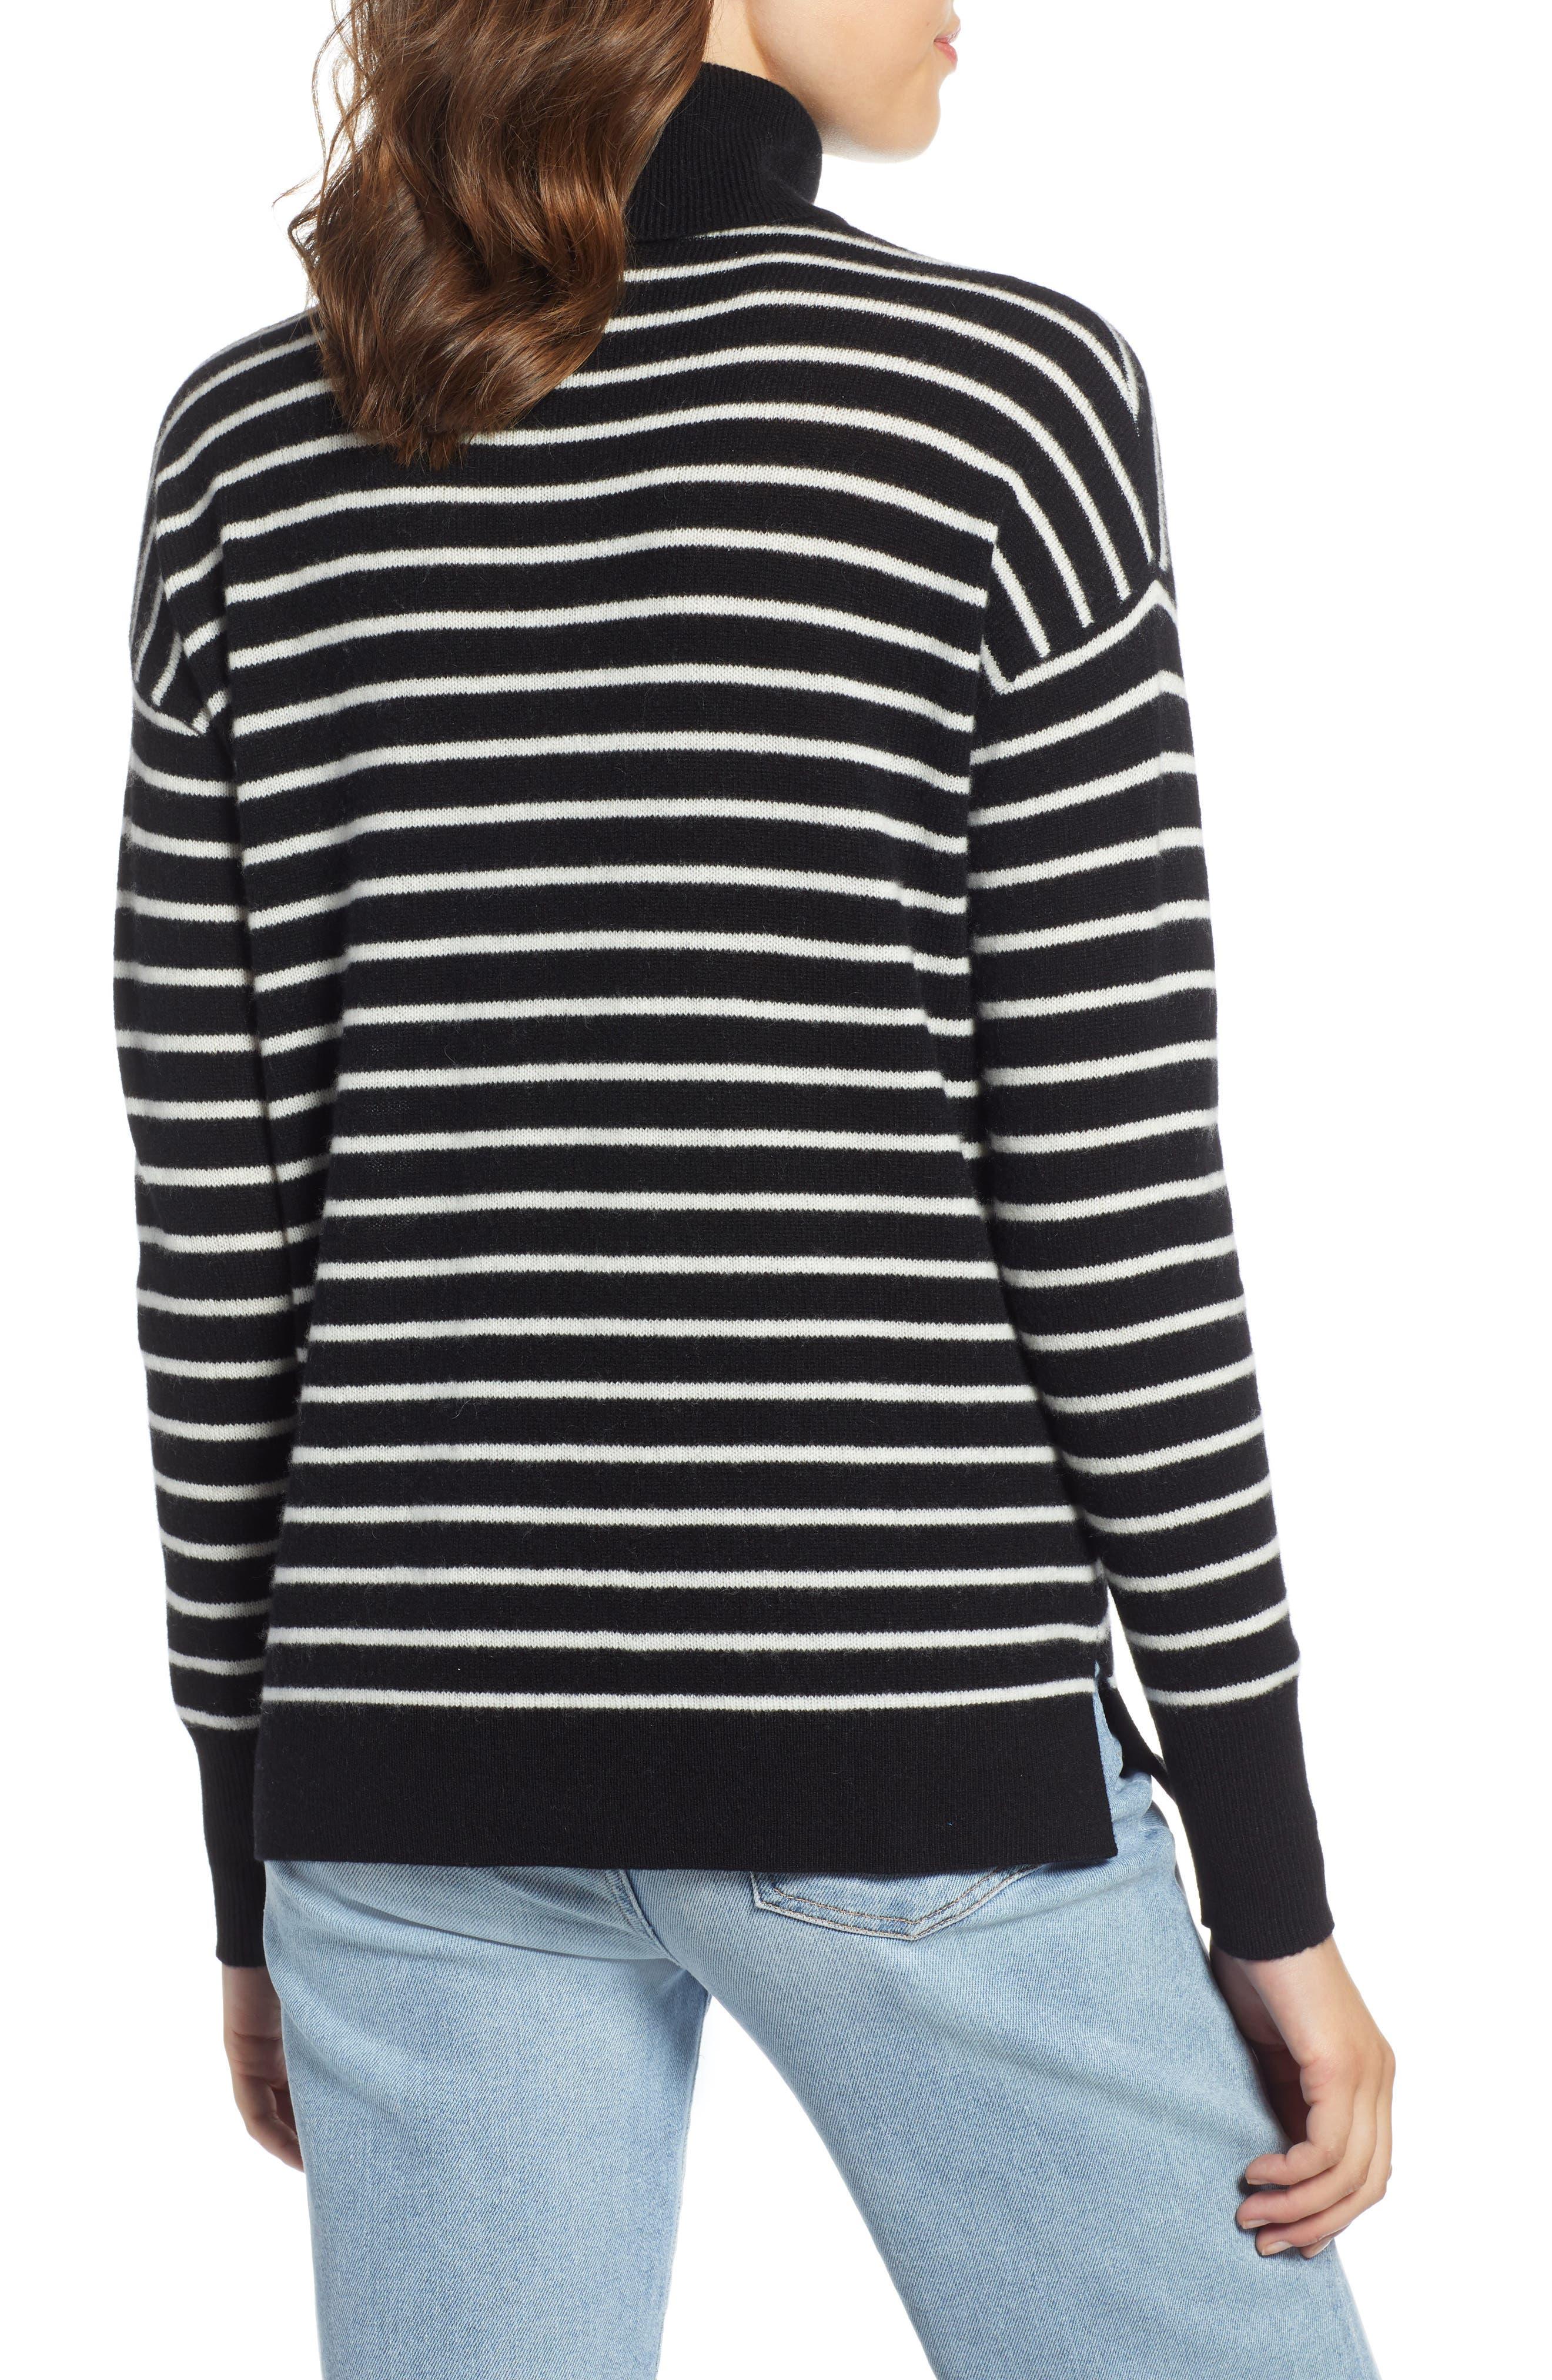 Cashmere Turtleneck Sweater,                             Alternate thumbnail 2, color,                             BLACK- IVORY STRIPE